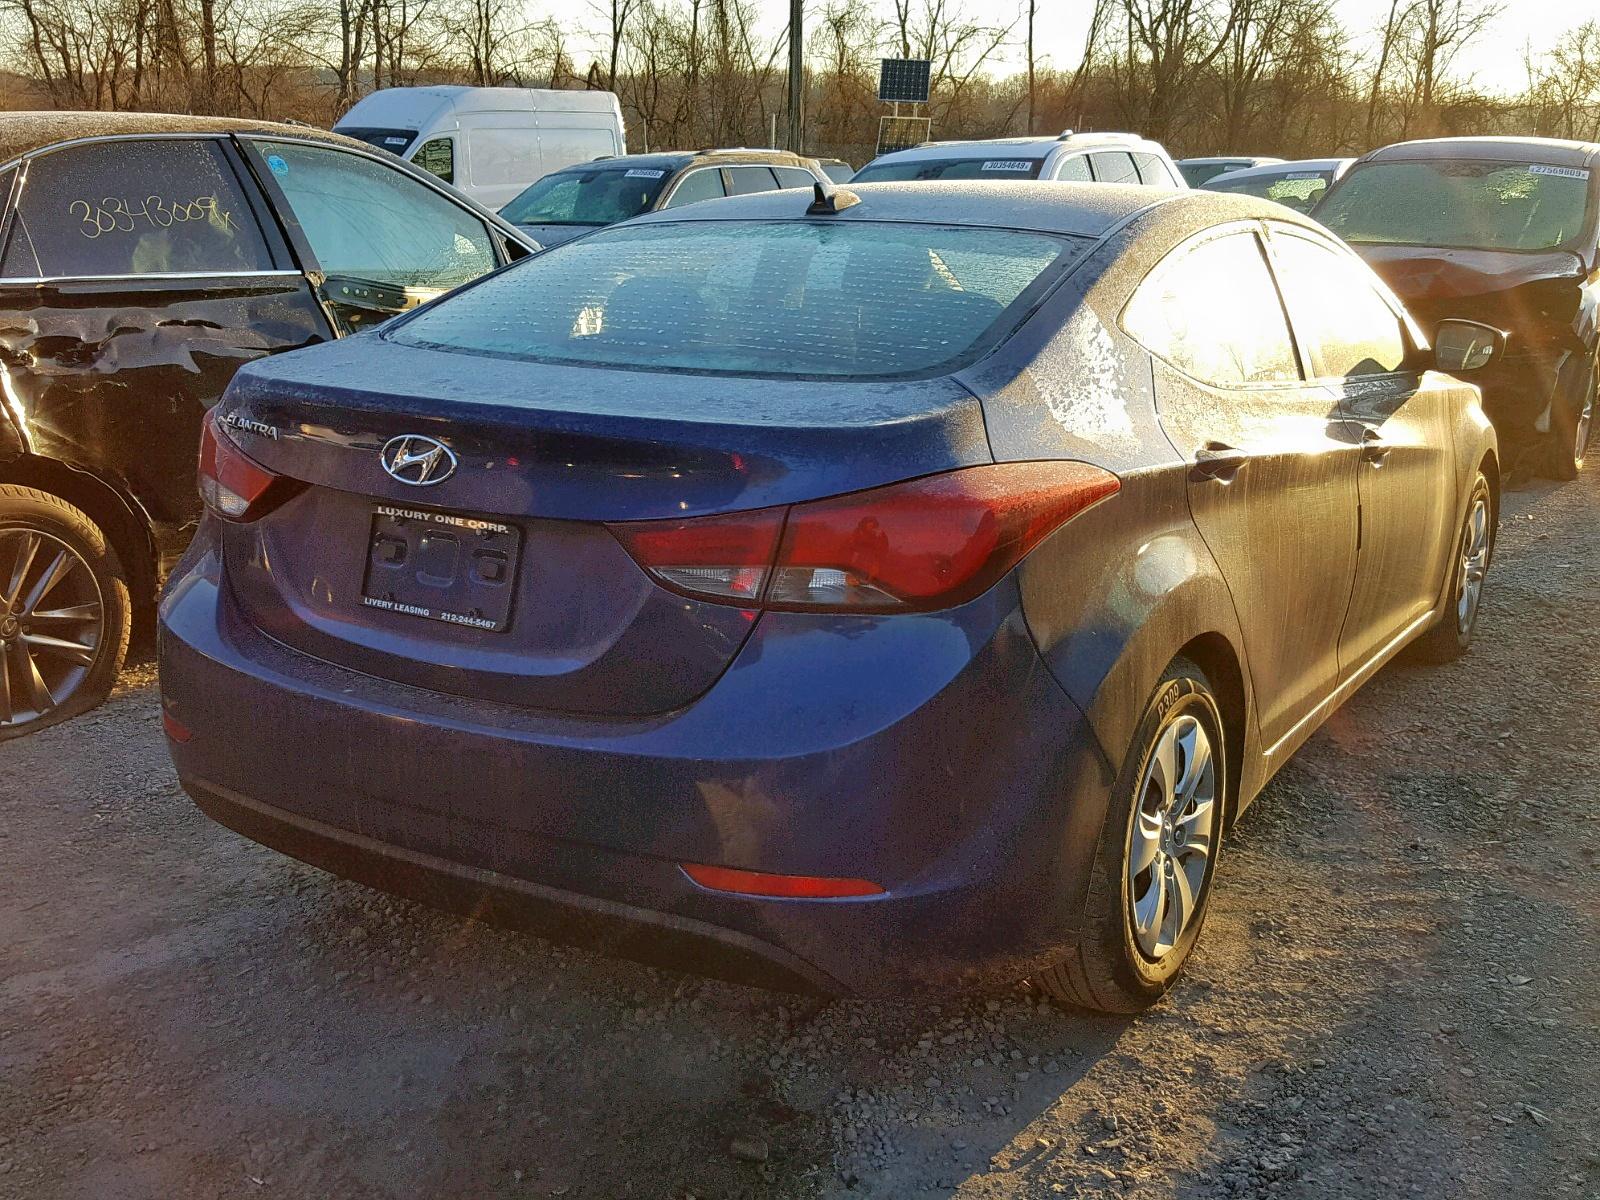 2016 Hyundai Elantra Se 1.8L rear view